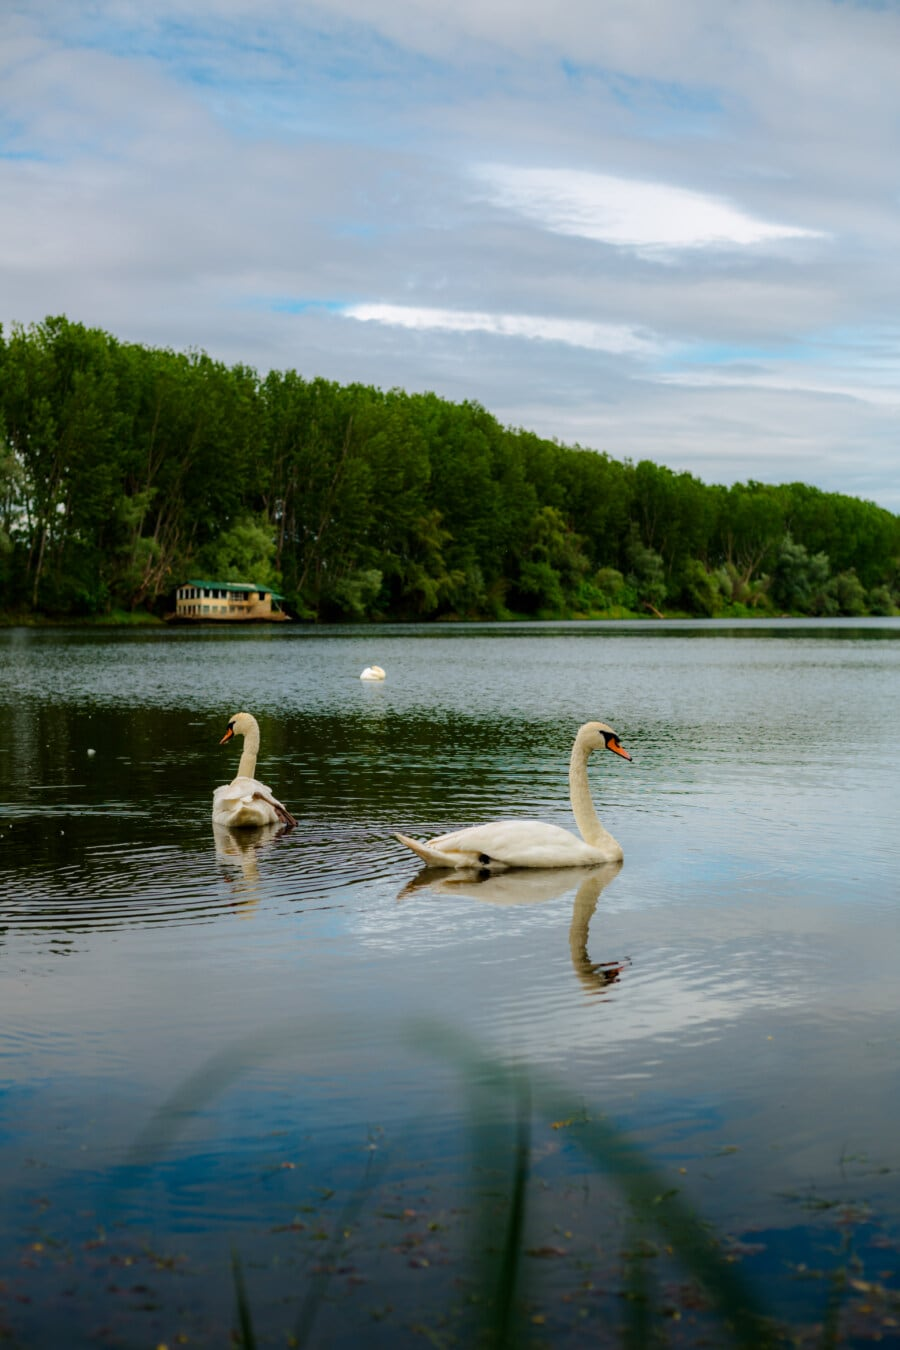 akvatiske fugl, svane, naturlige habitat, nasjonalpark, innsjøen, innsjø, Flamingo, vann, natur, fuglen